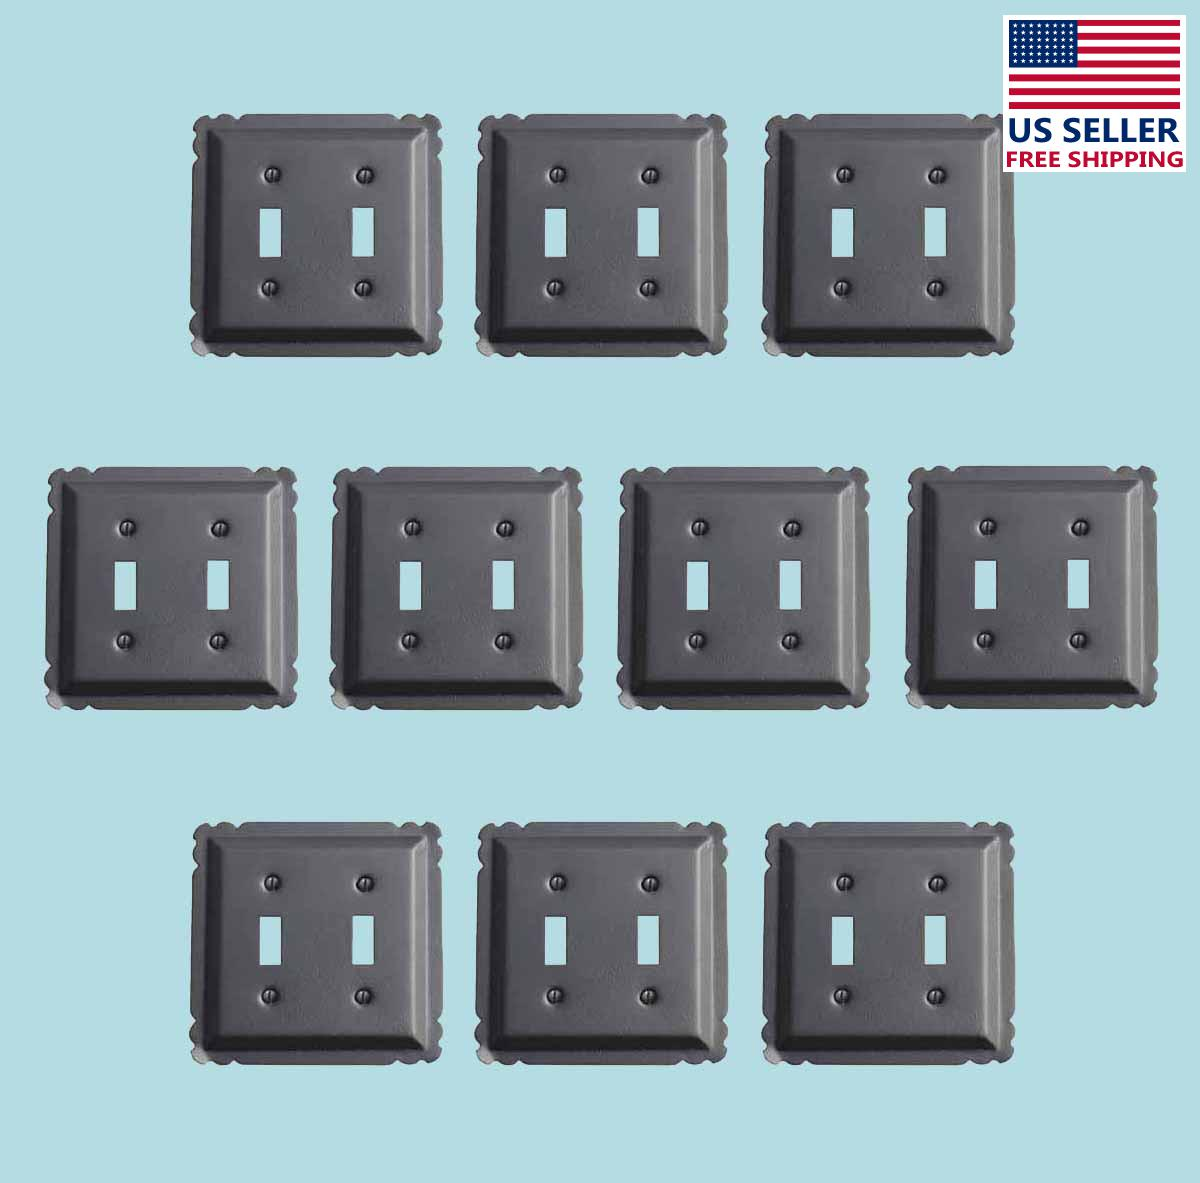 10 Switchplate Black Steel Double Toggle | Renovators Supply 2